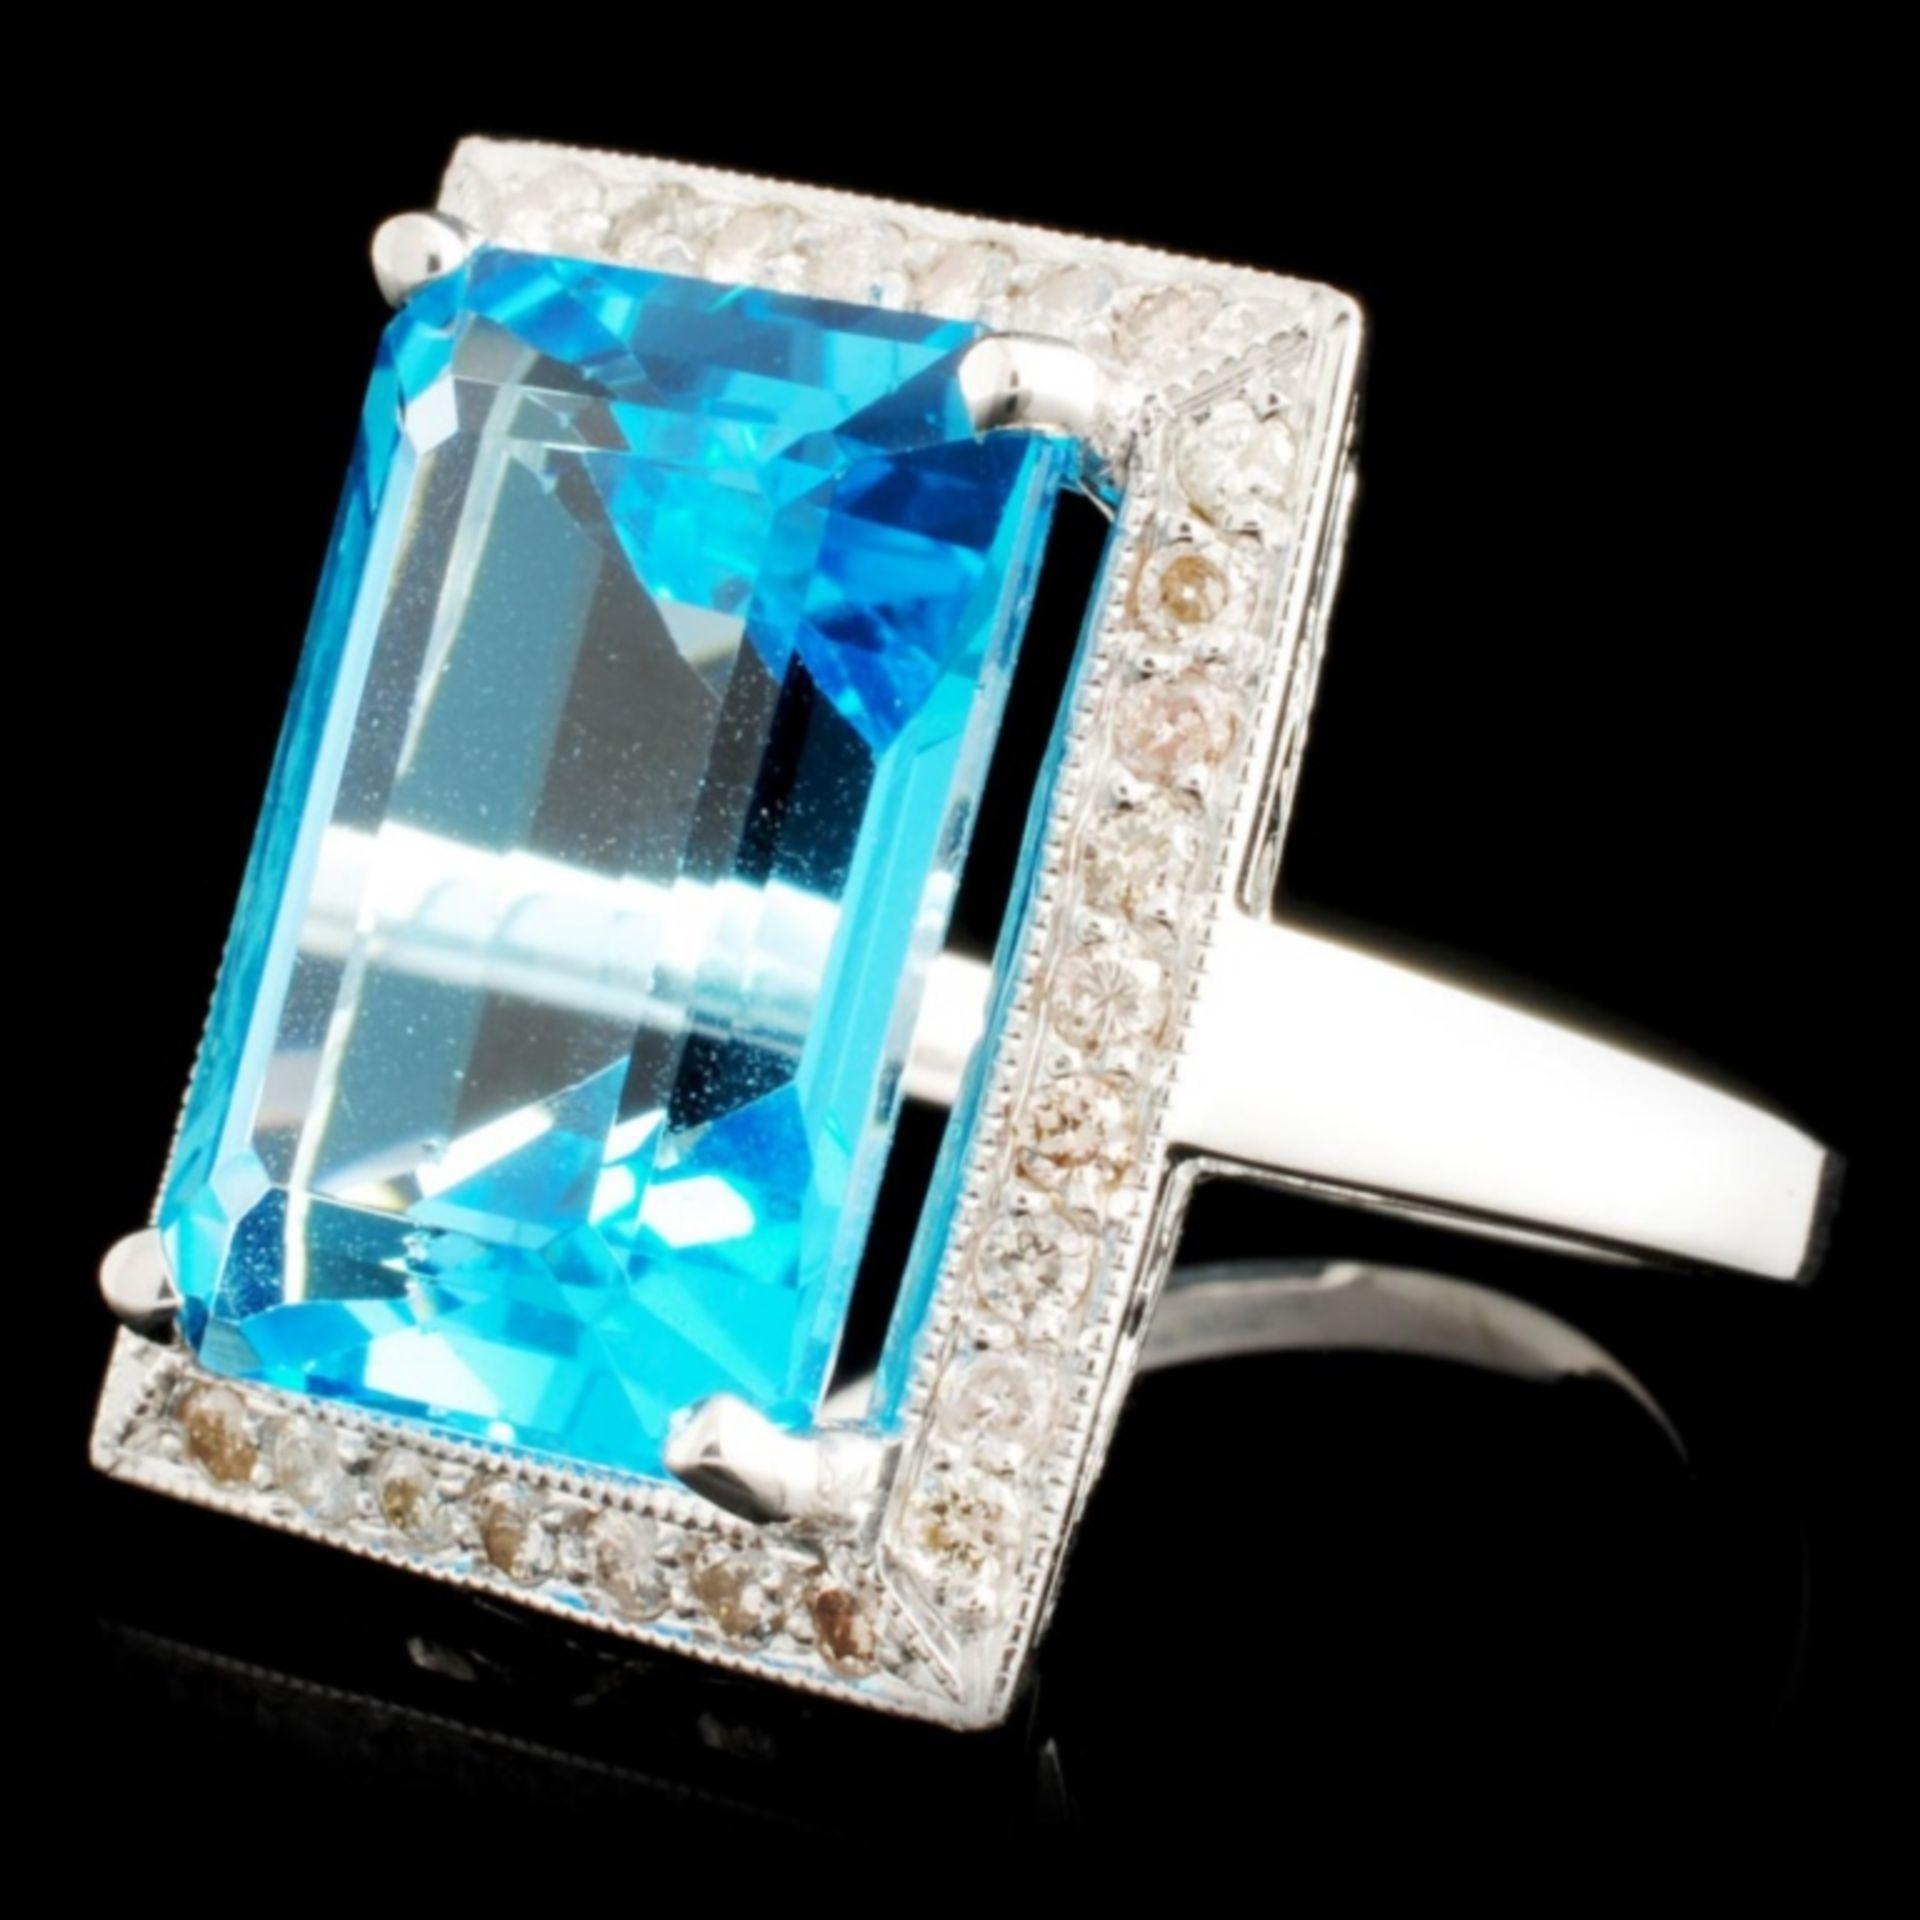 18K Gold 13.96ct Topaz & 0.52ctw Diamond Ring - Image 2 of 4